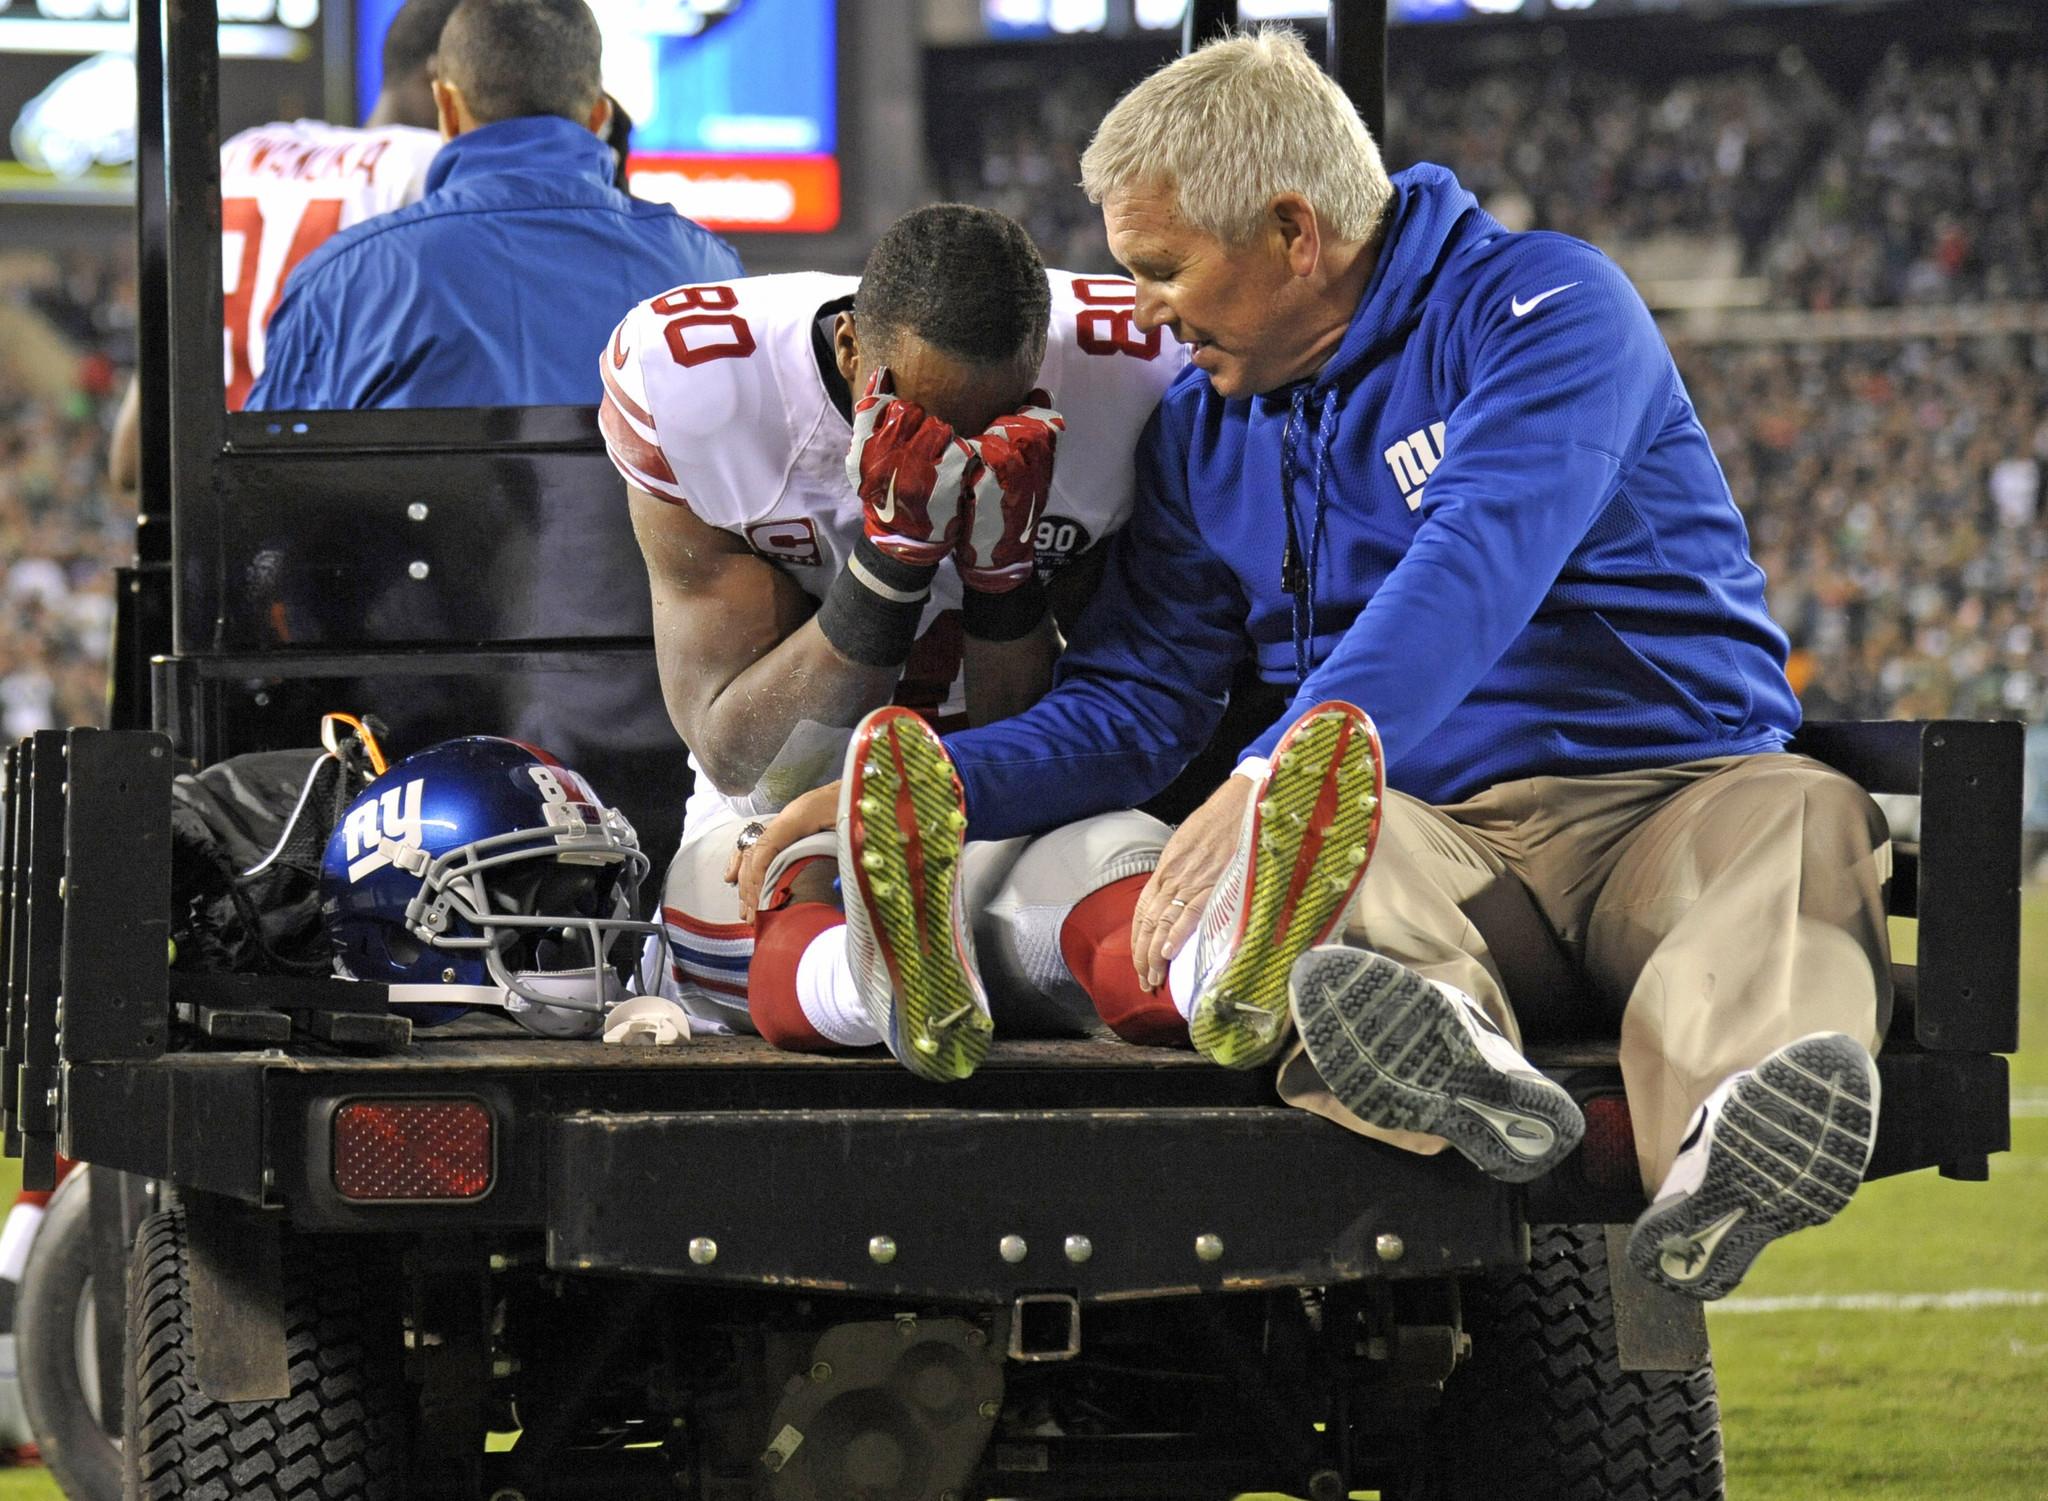 Giants WR Victor Cruz tears patellar tendon